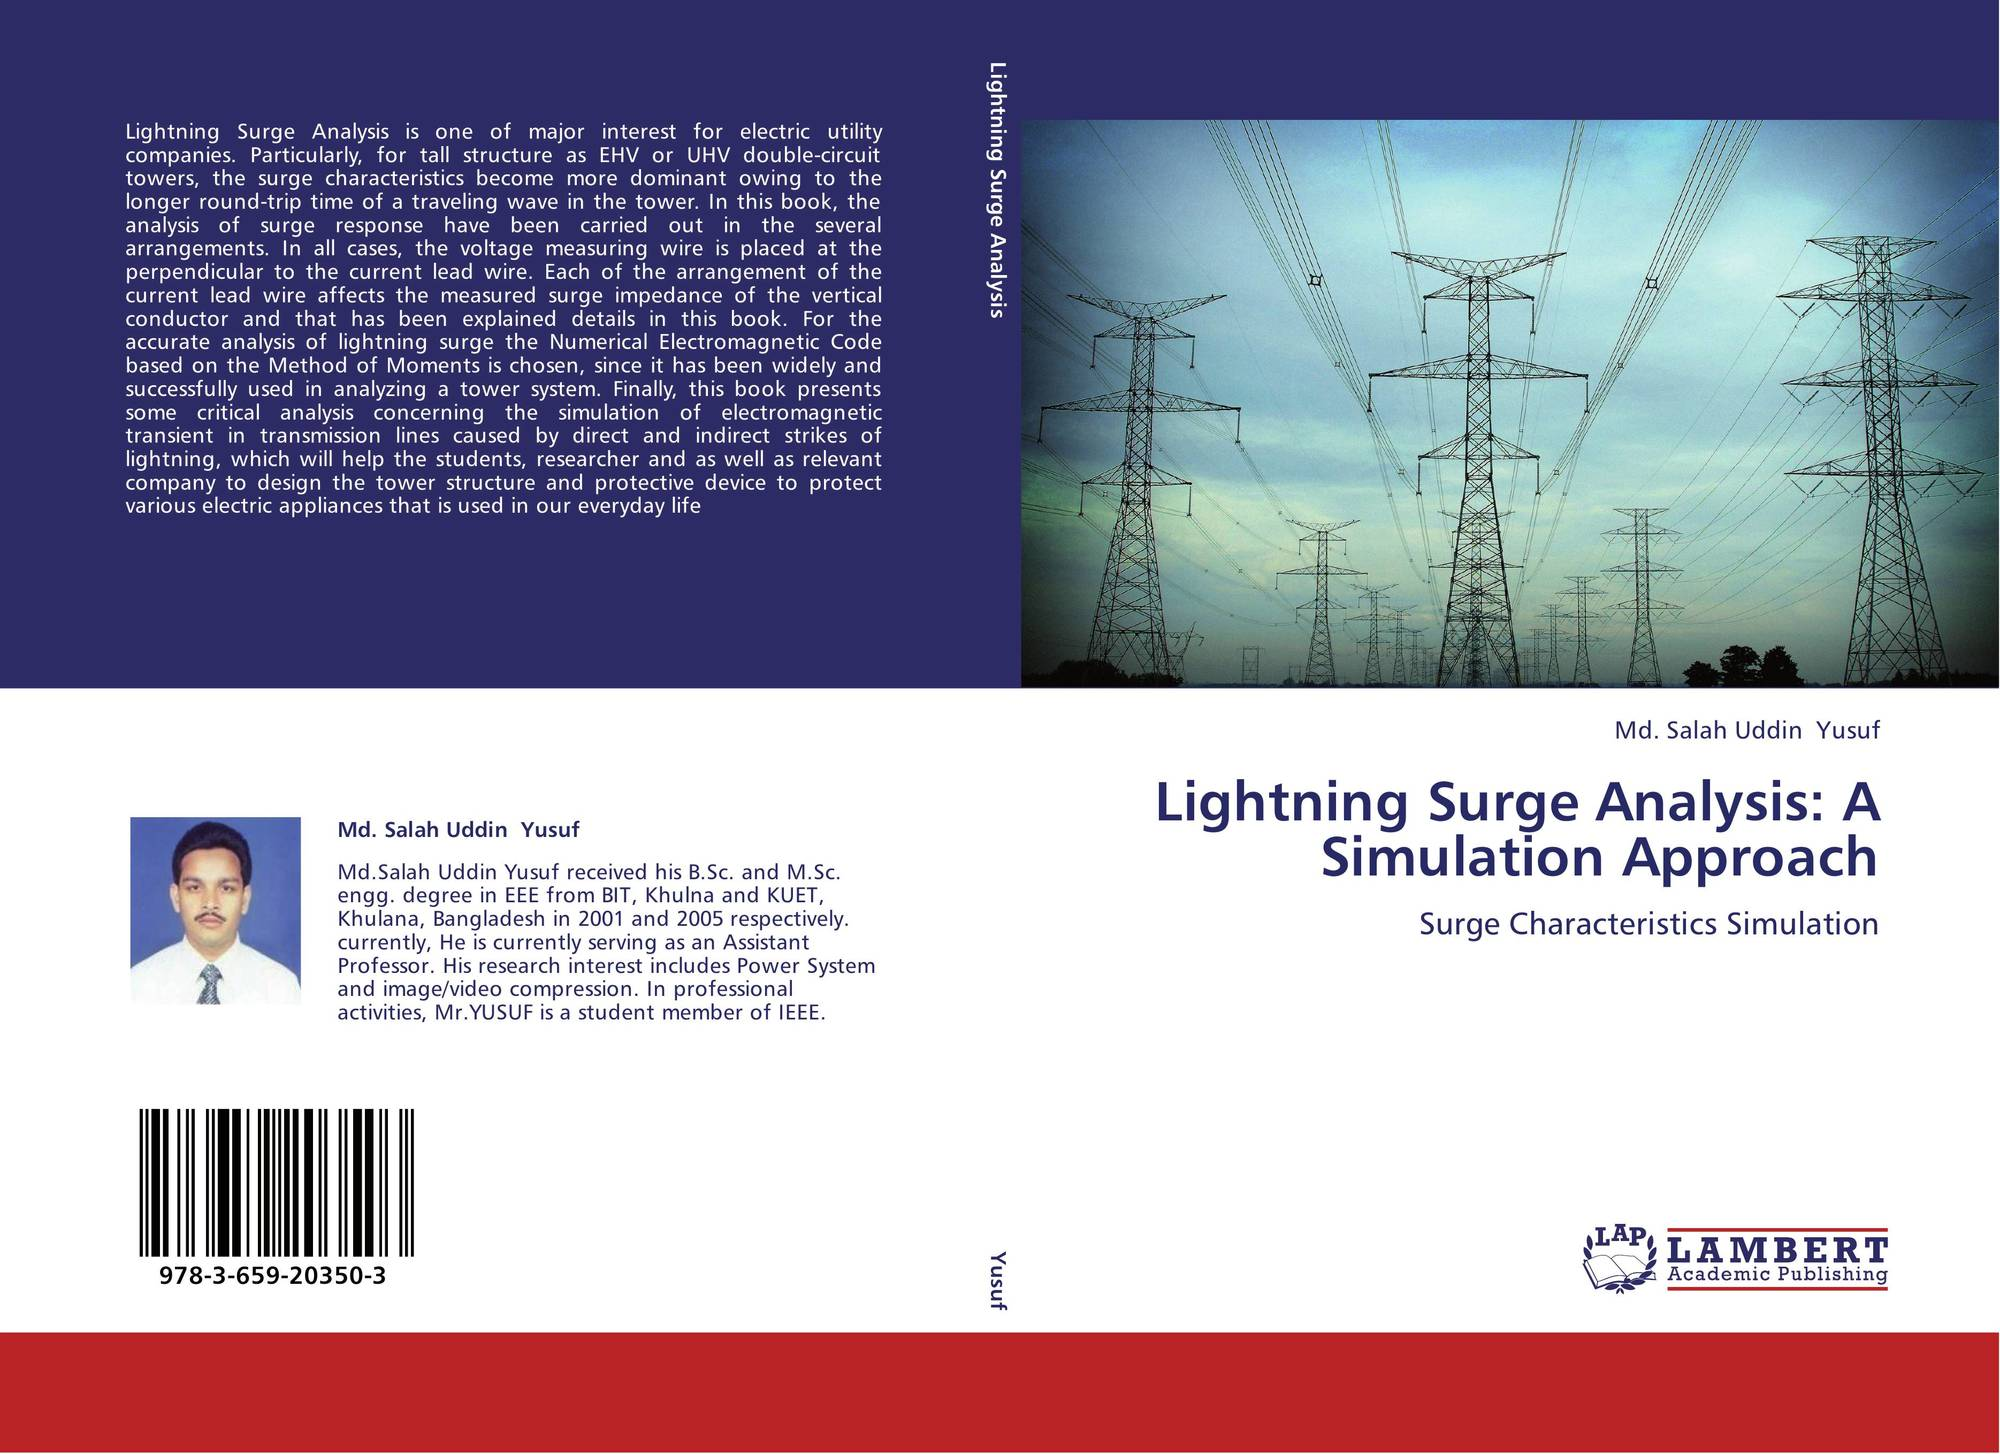 Lightning Surge Analysis: A Simulation Approach, 978-3-659